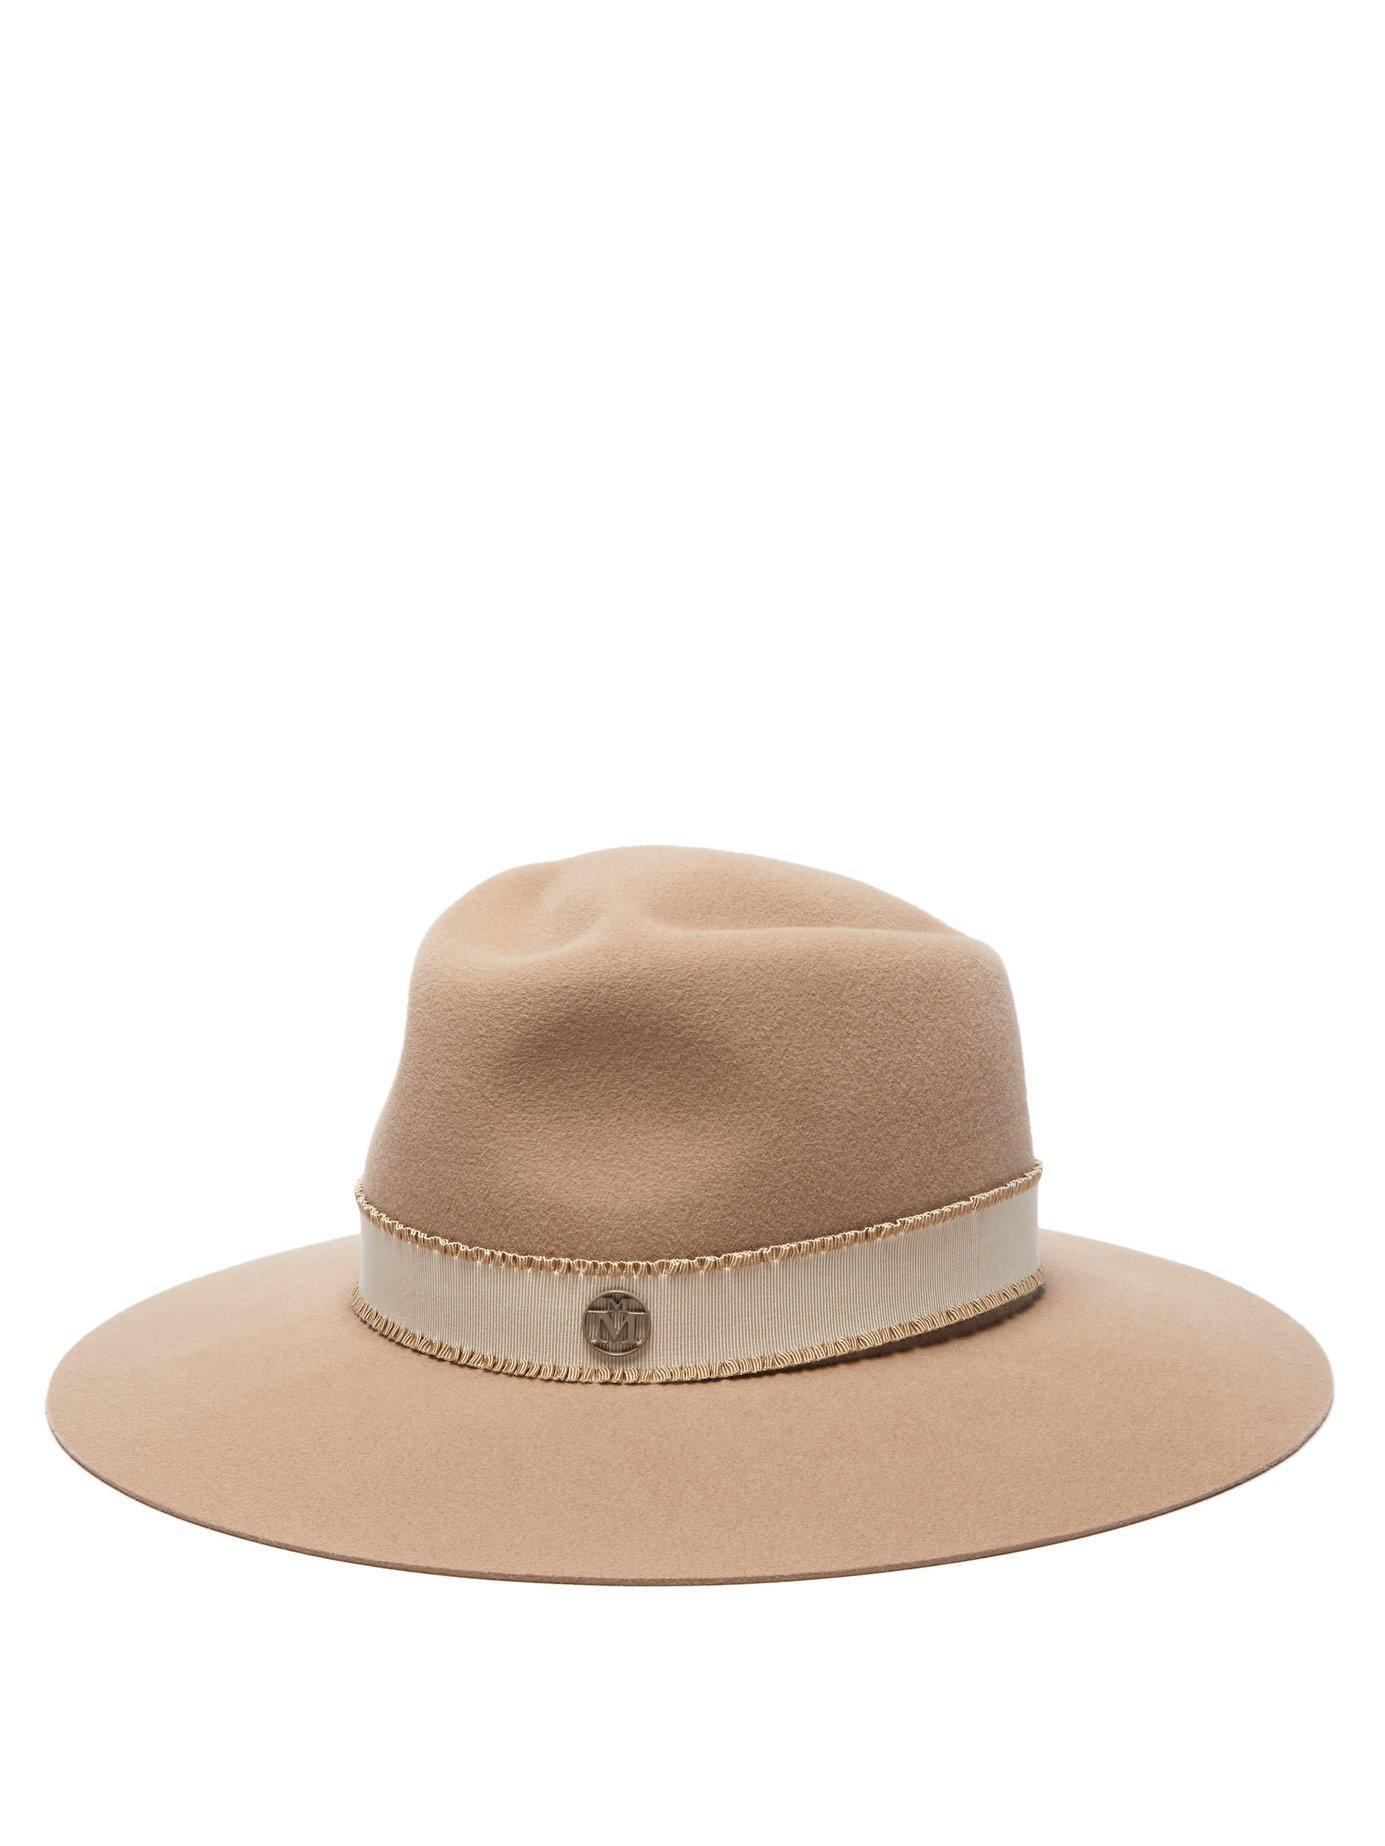 47cf489f67a Lyst - Maison Michel Charles Felt Fedora Hat in Natural